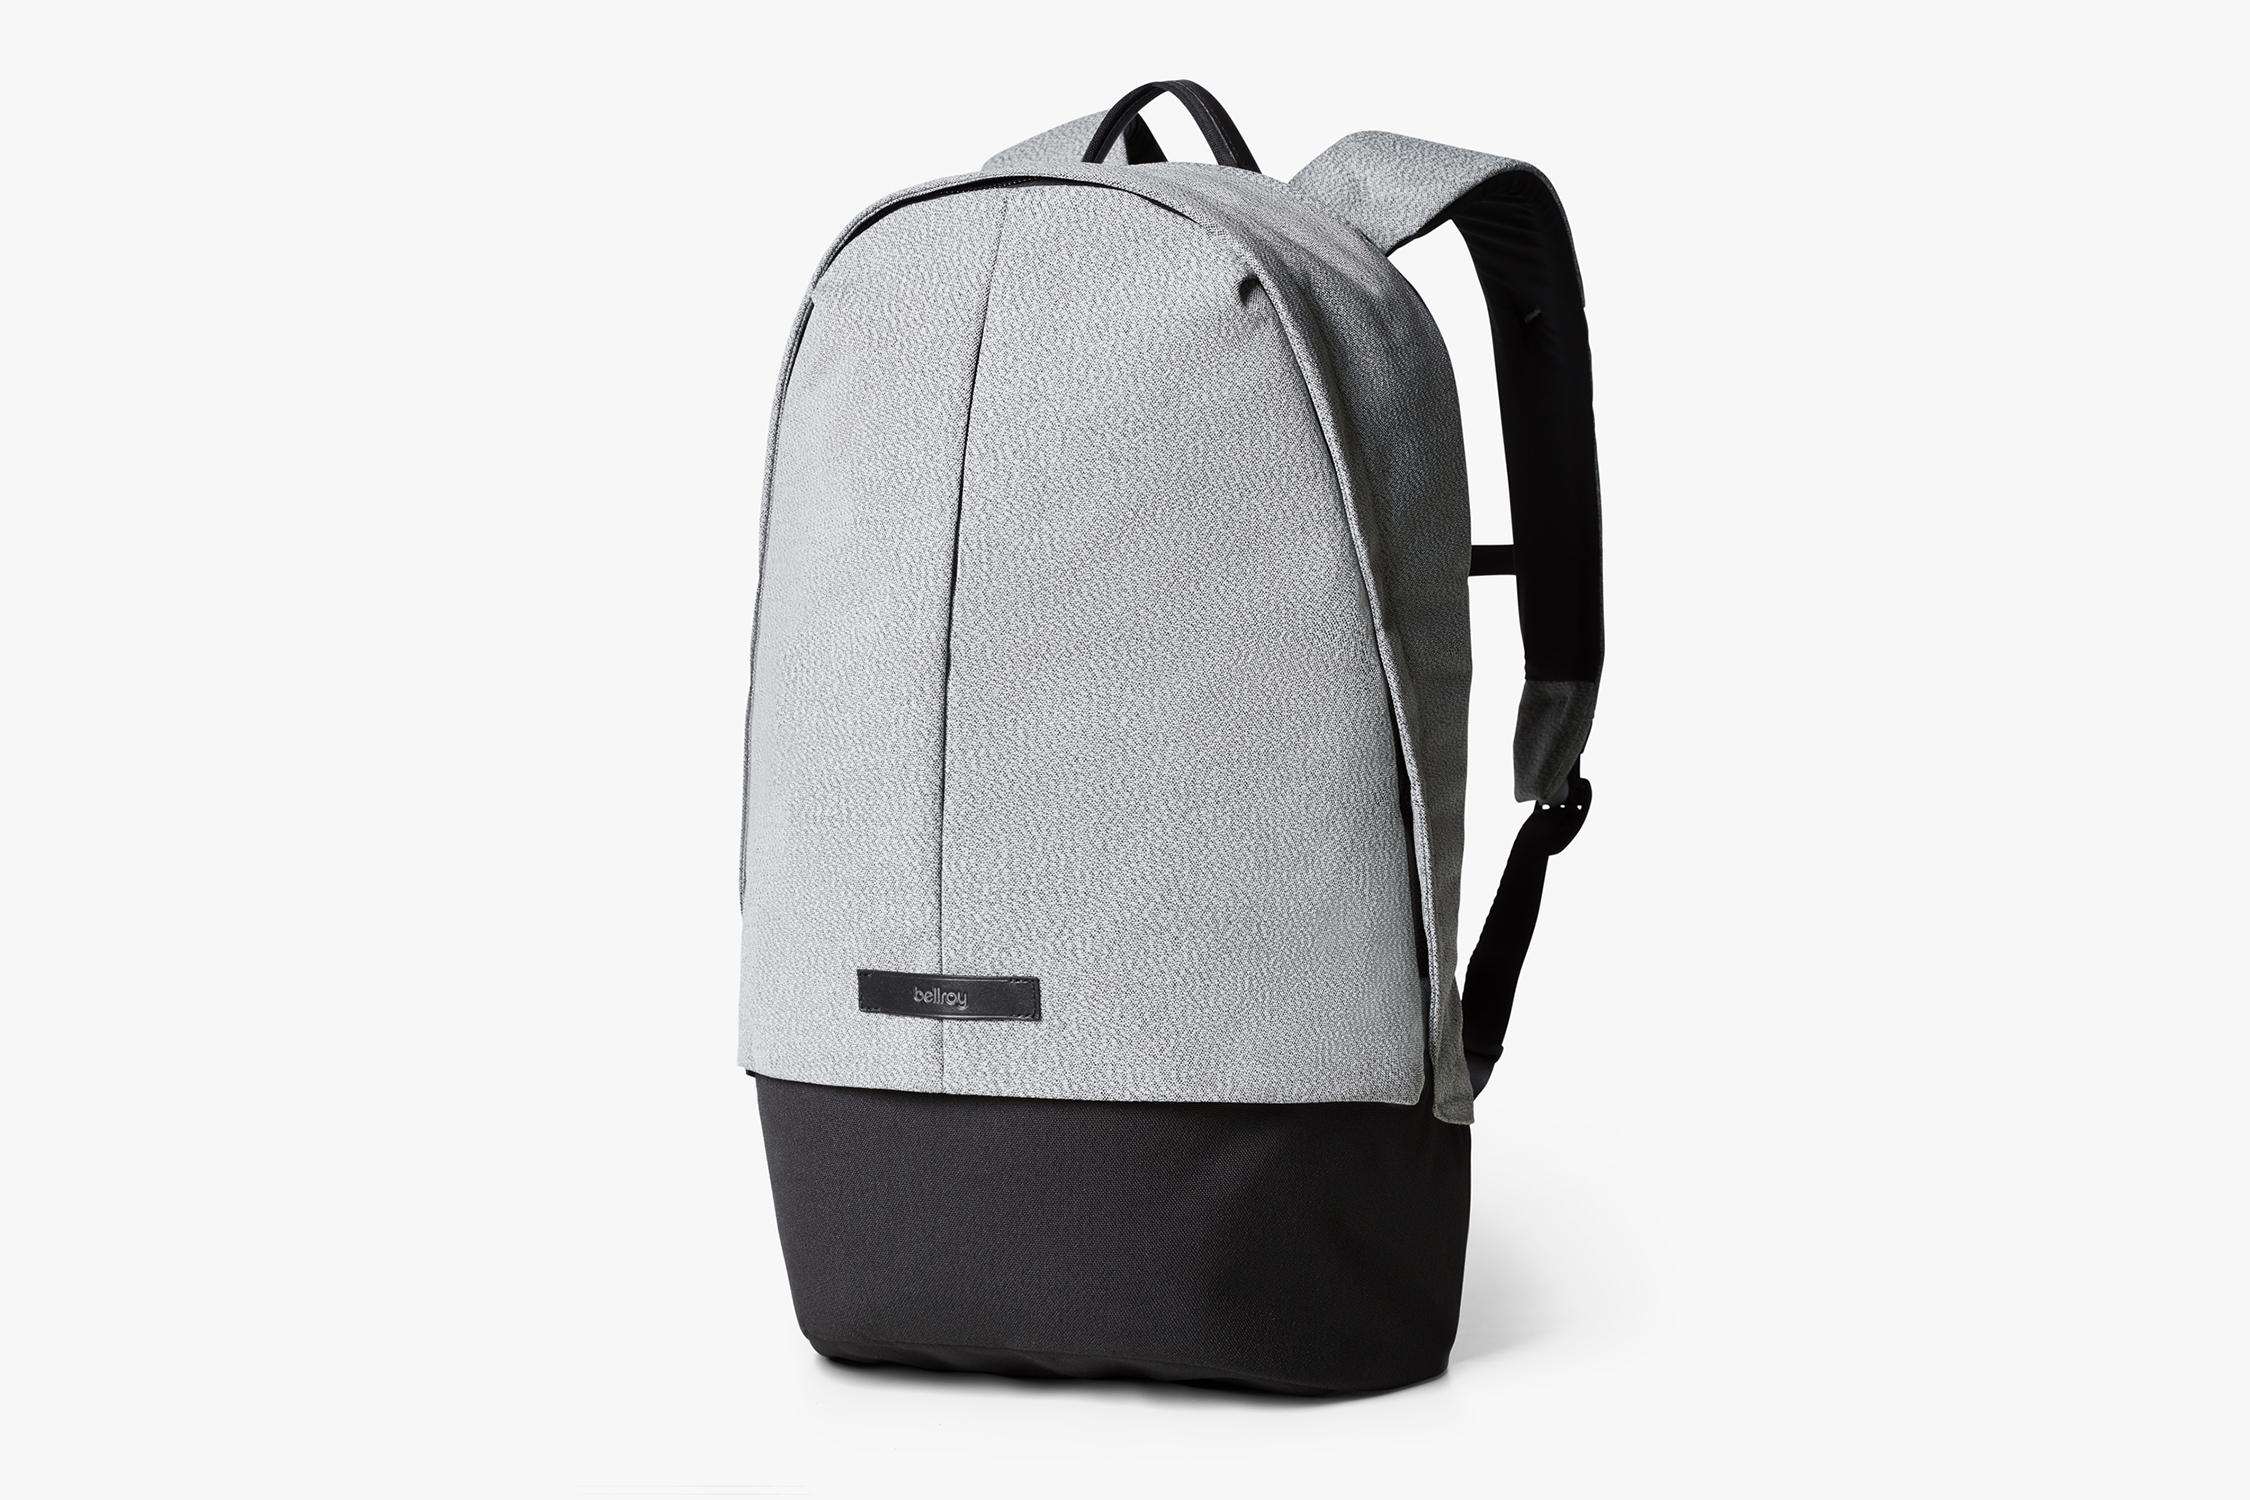 Bellroy classic backpack plus.jpg